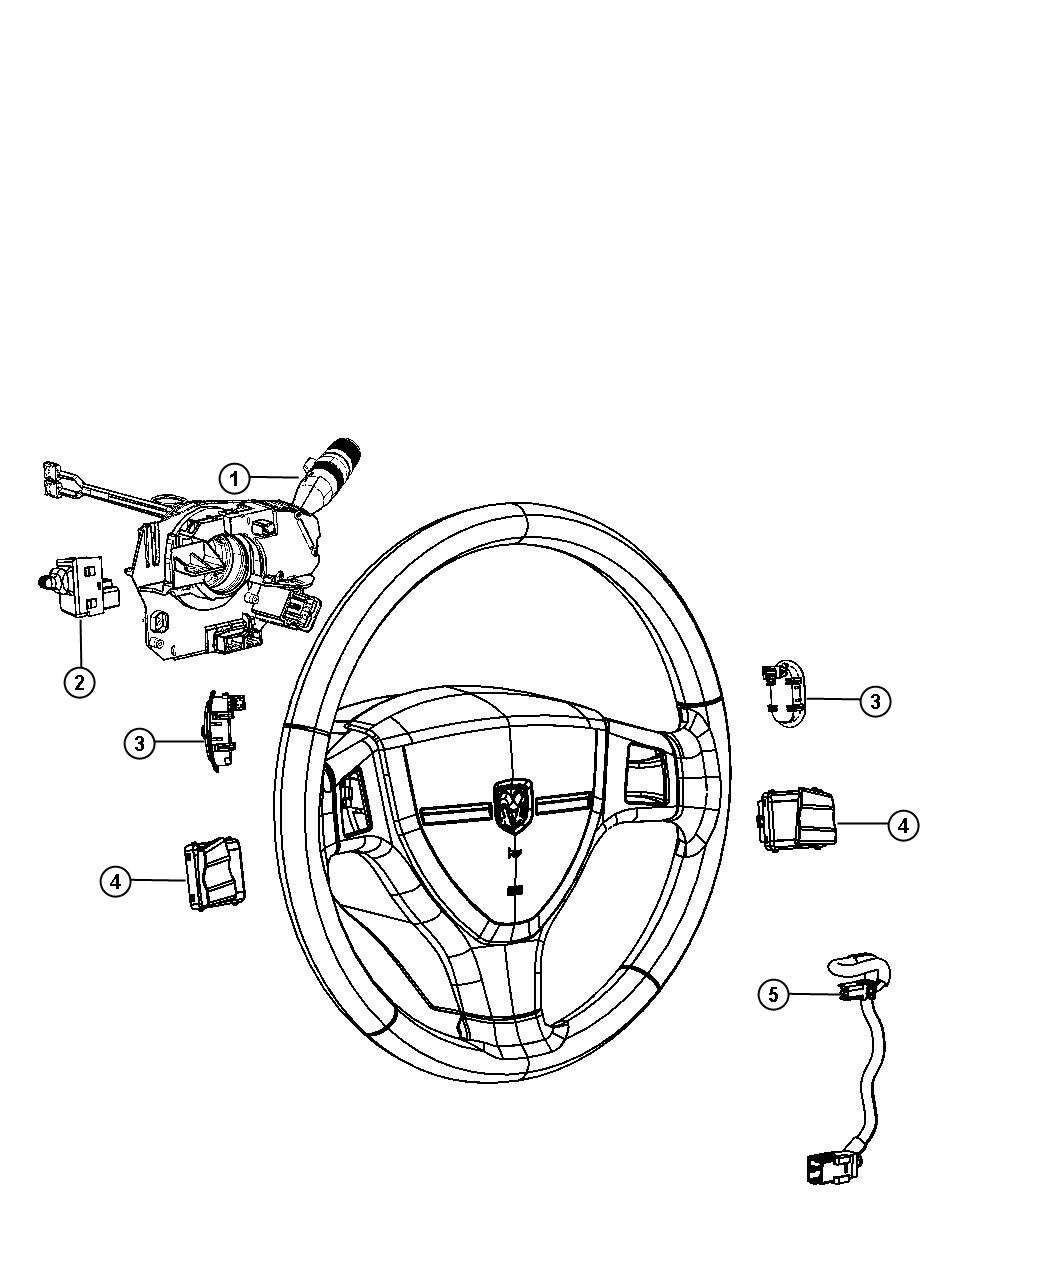 Chrysler Aspen Switch. Radio control, remote radio. Right